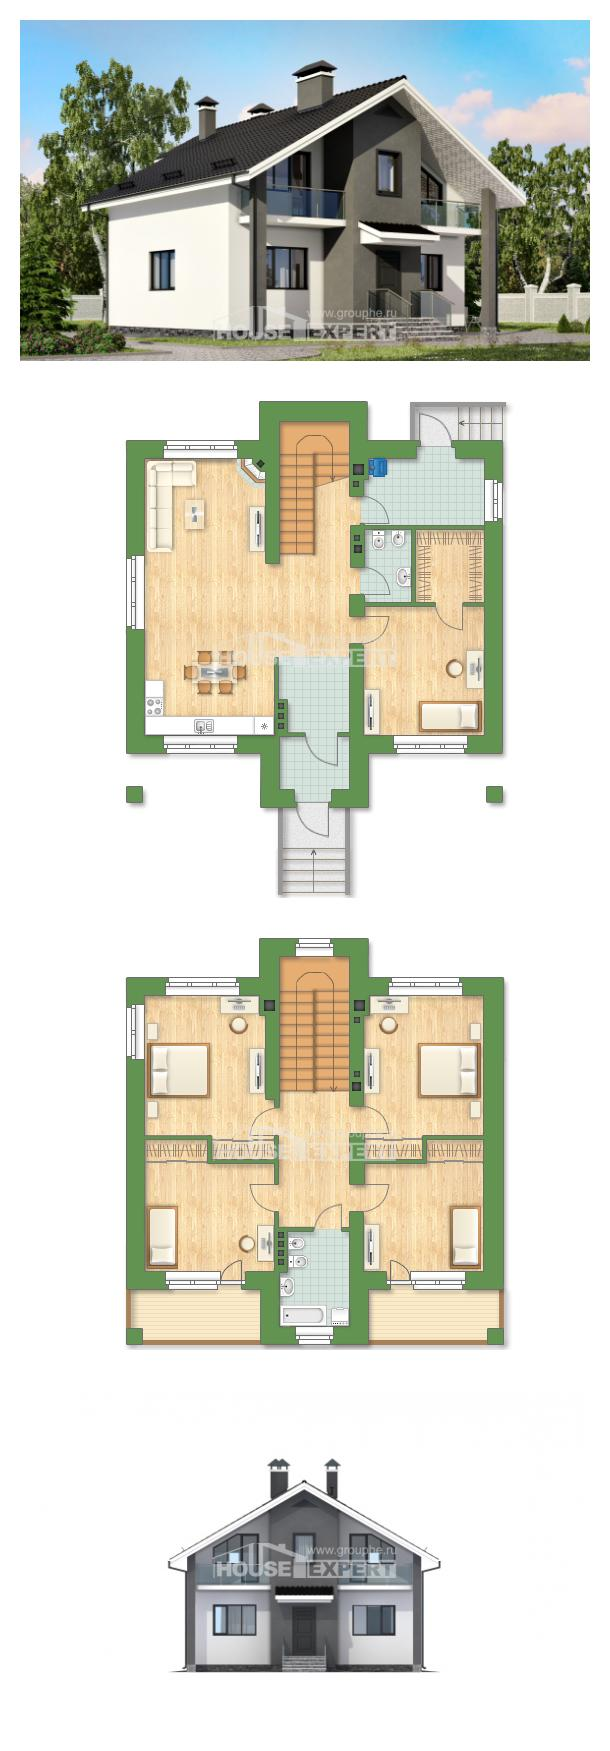 Proyecto de casa 150-005-L   House Expert